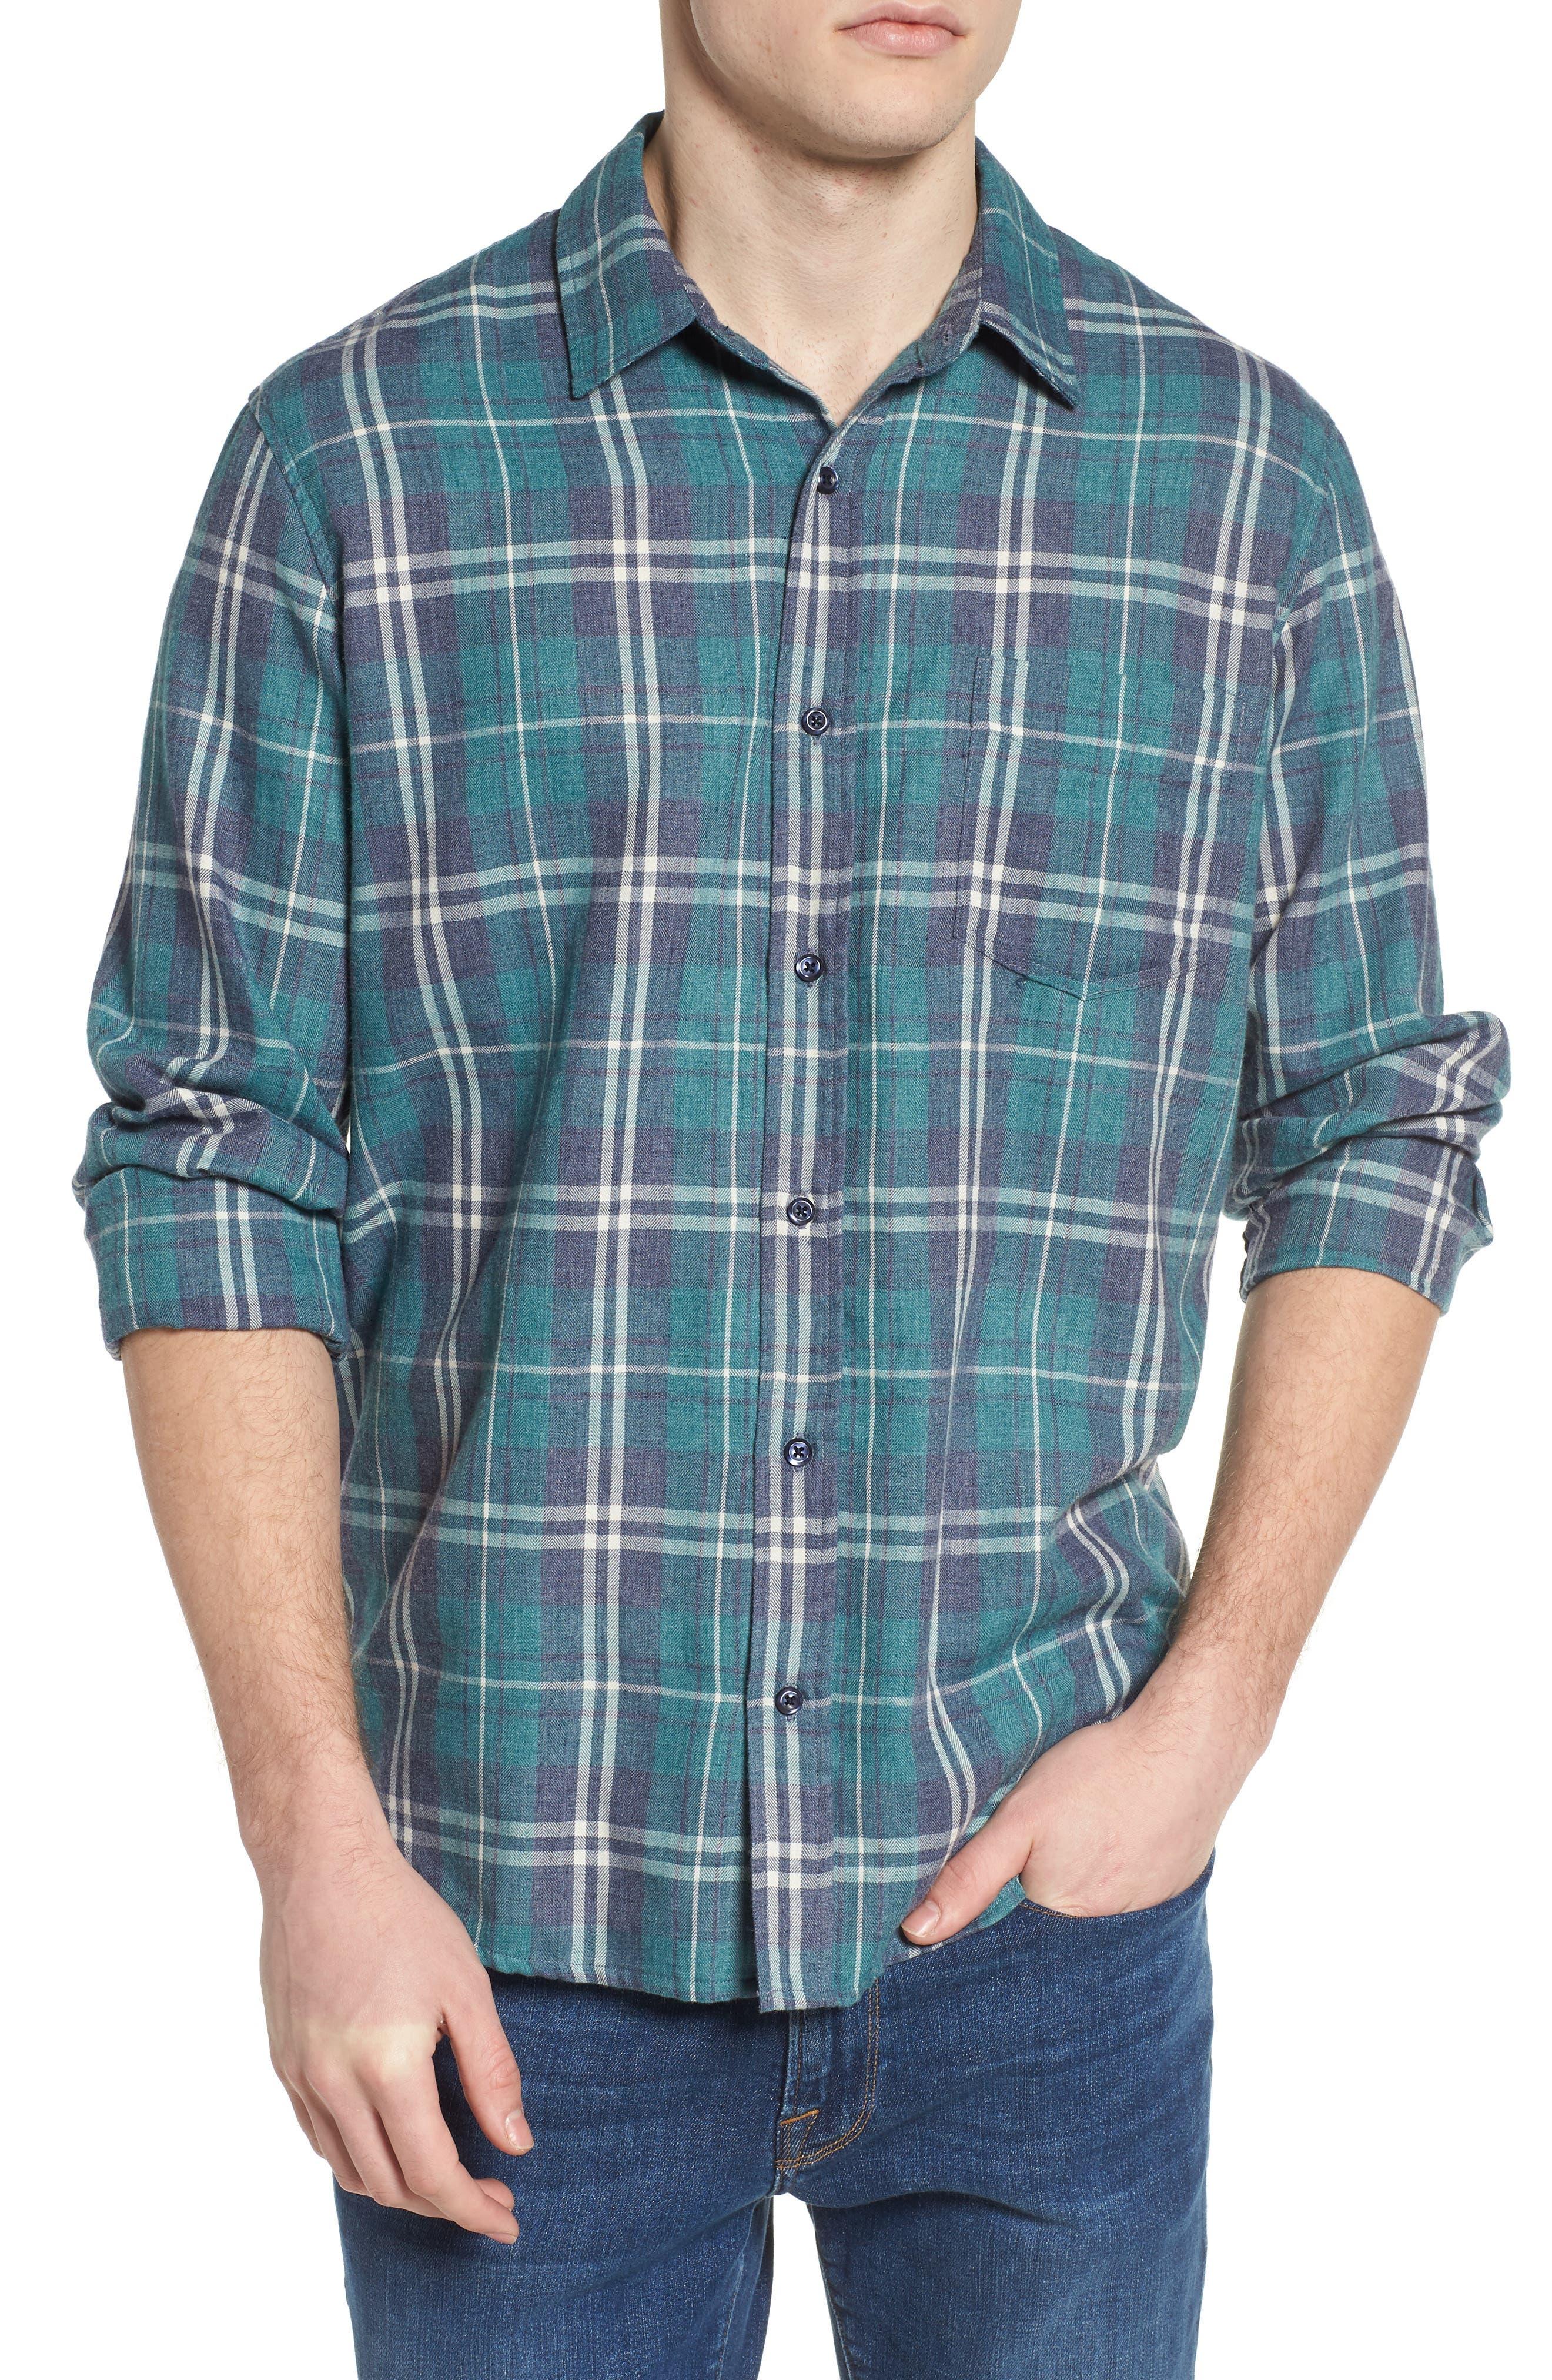 Lennox Slim Fit Plaid Woven Shirt,                         Main,                         color, Veridian Navy White